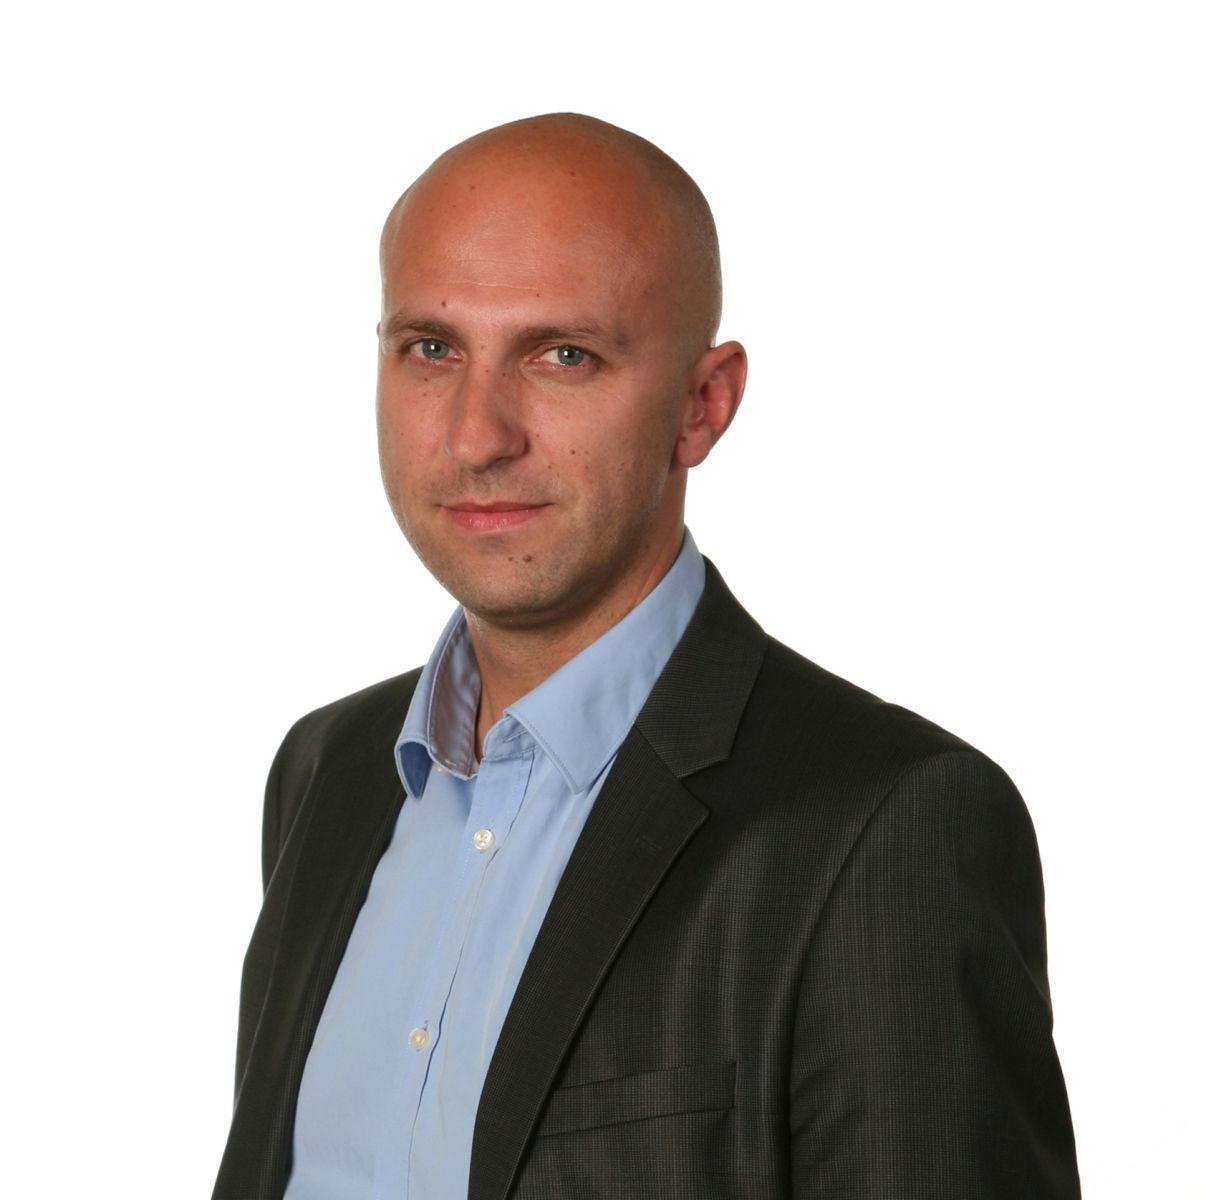 gregor, levič, CEO, iDMC